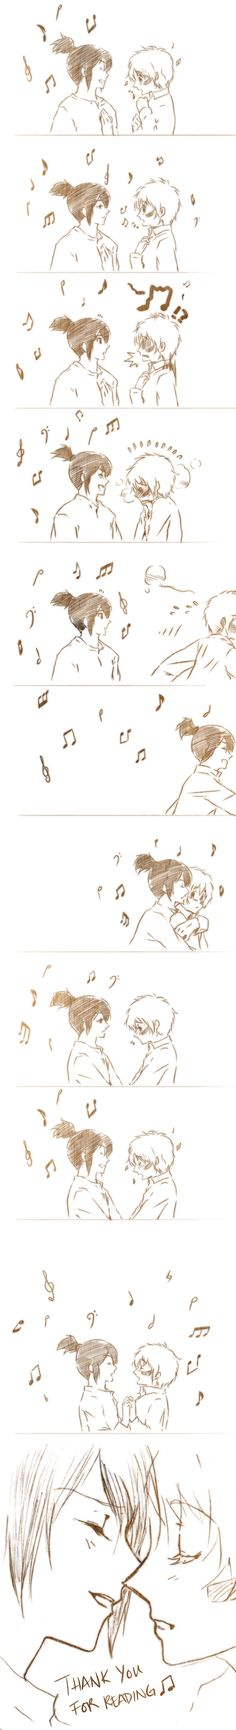 No. 6: Let's Sing A Song by piggyhoho.deviantart.com on @deviantART